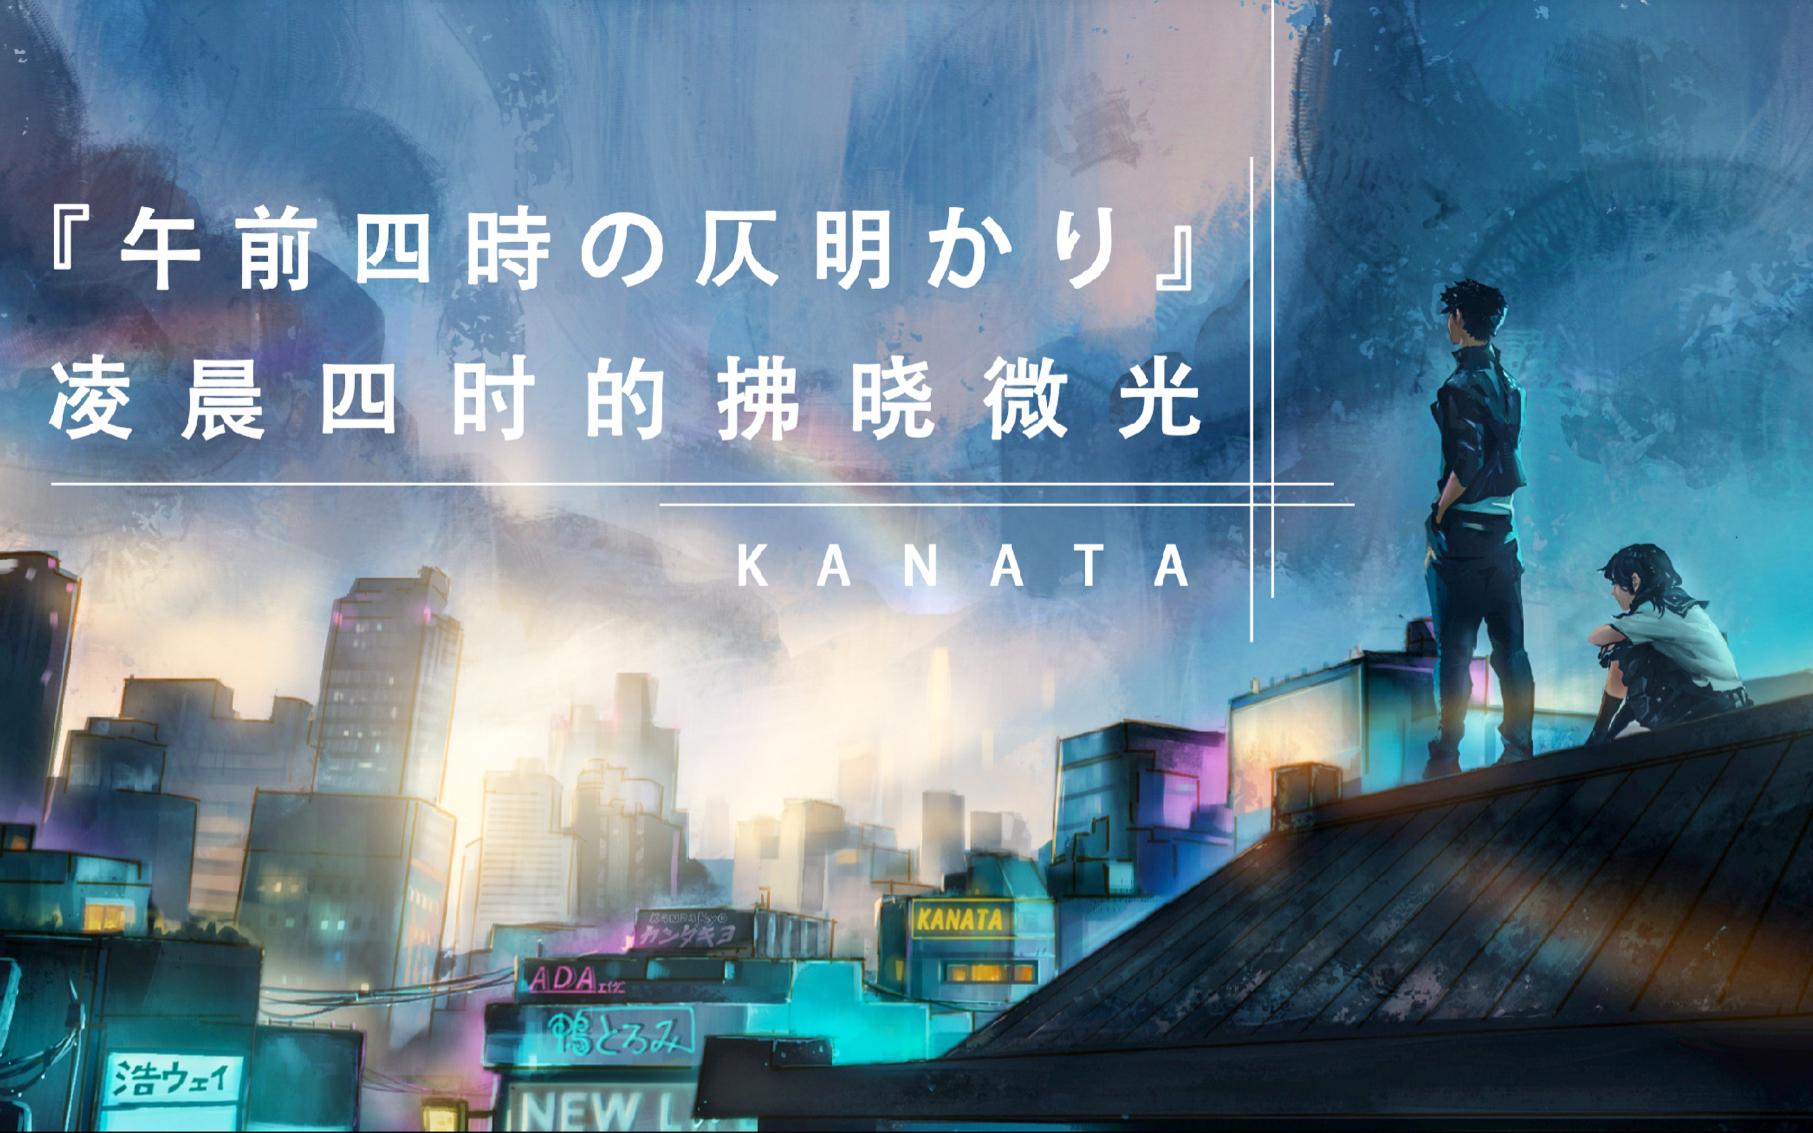 【KANATA原创处女作】『午前四時の仄明かり』/ 凌晨四时的拂晓微光【中日合作虚拟乐队】